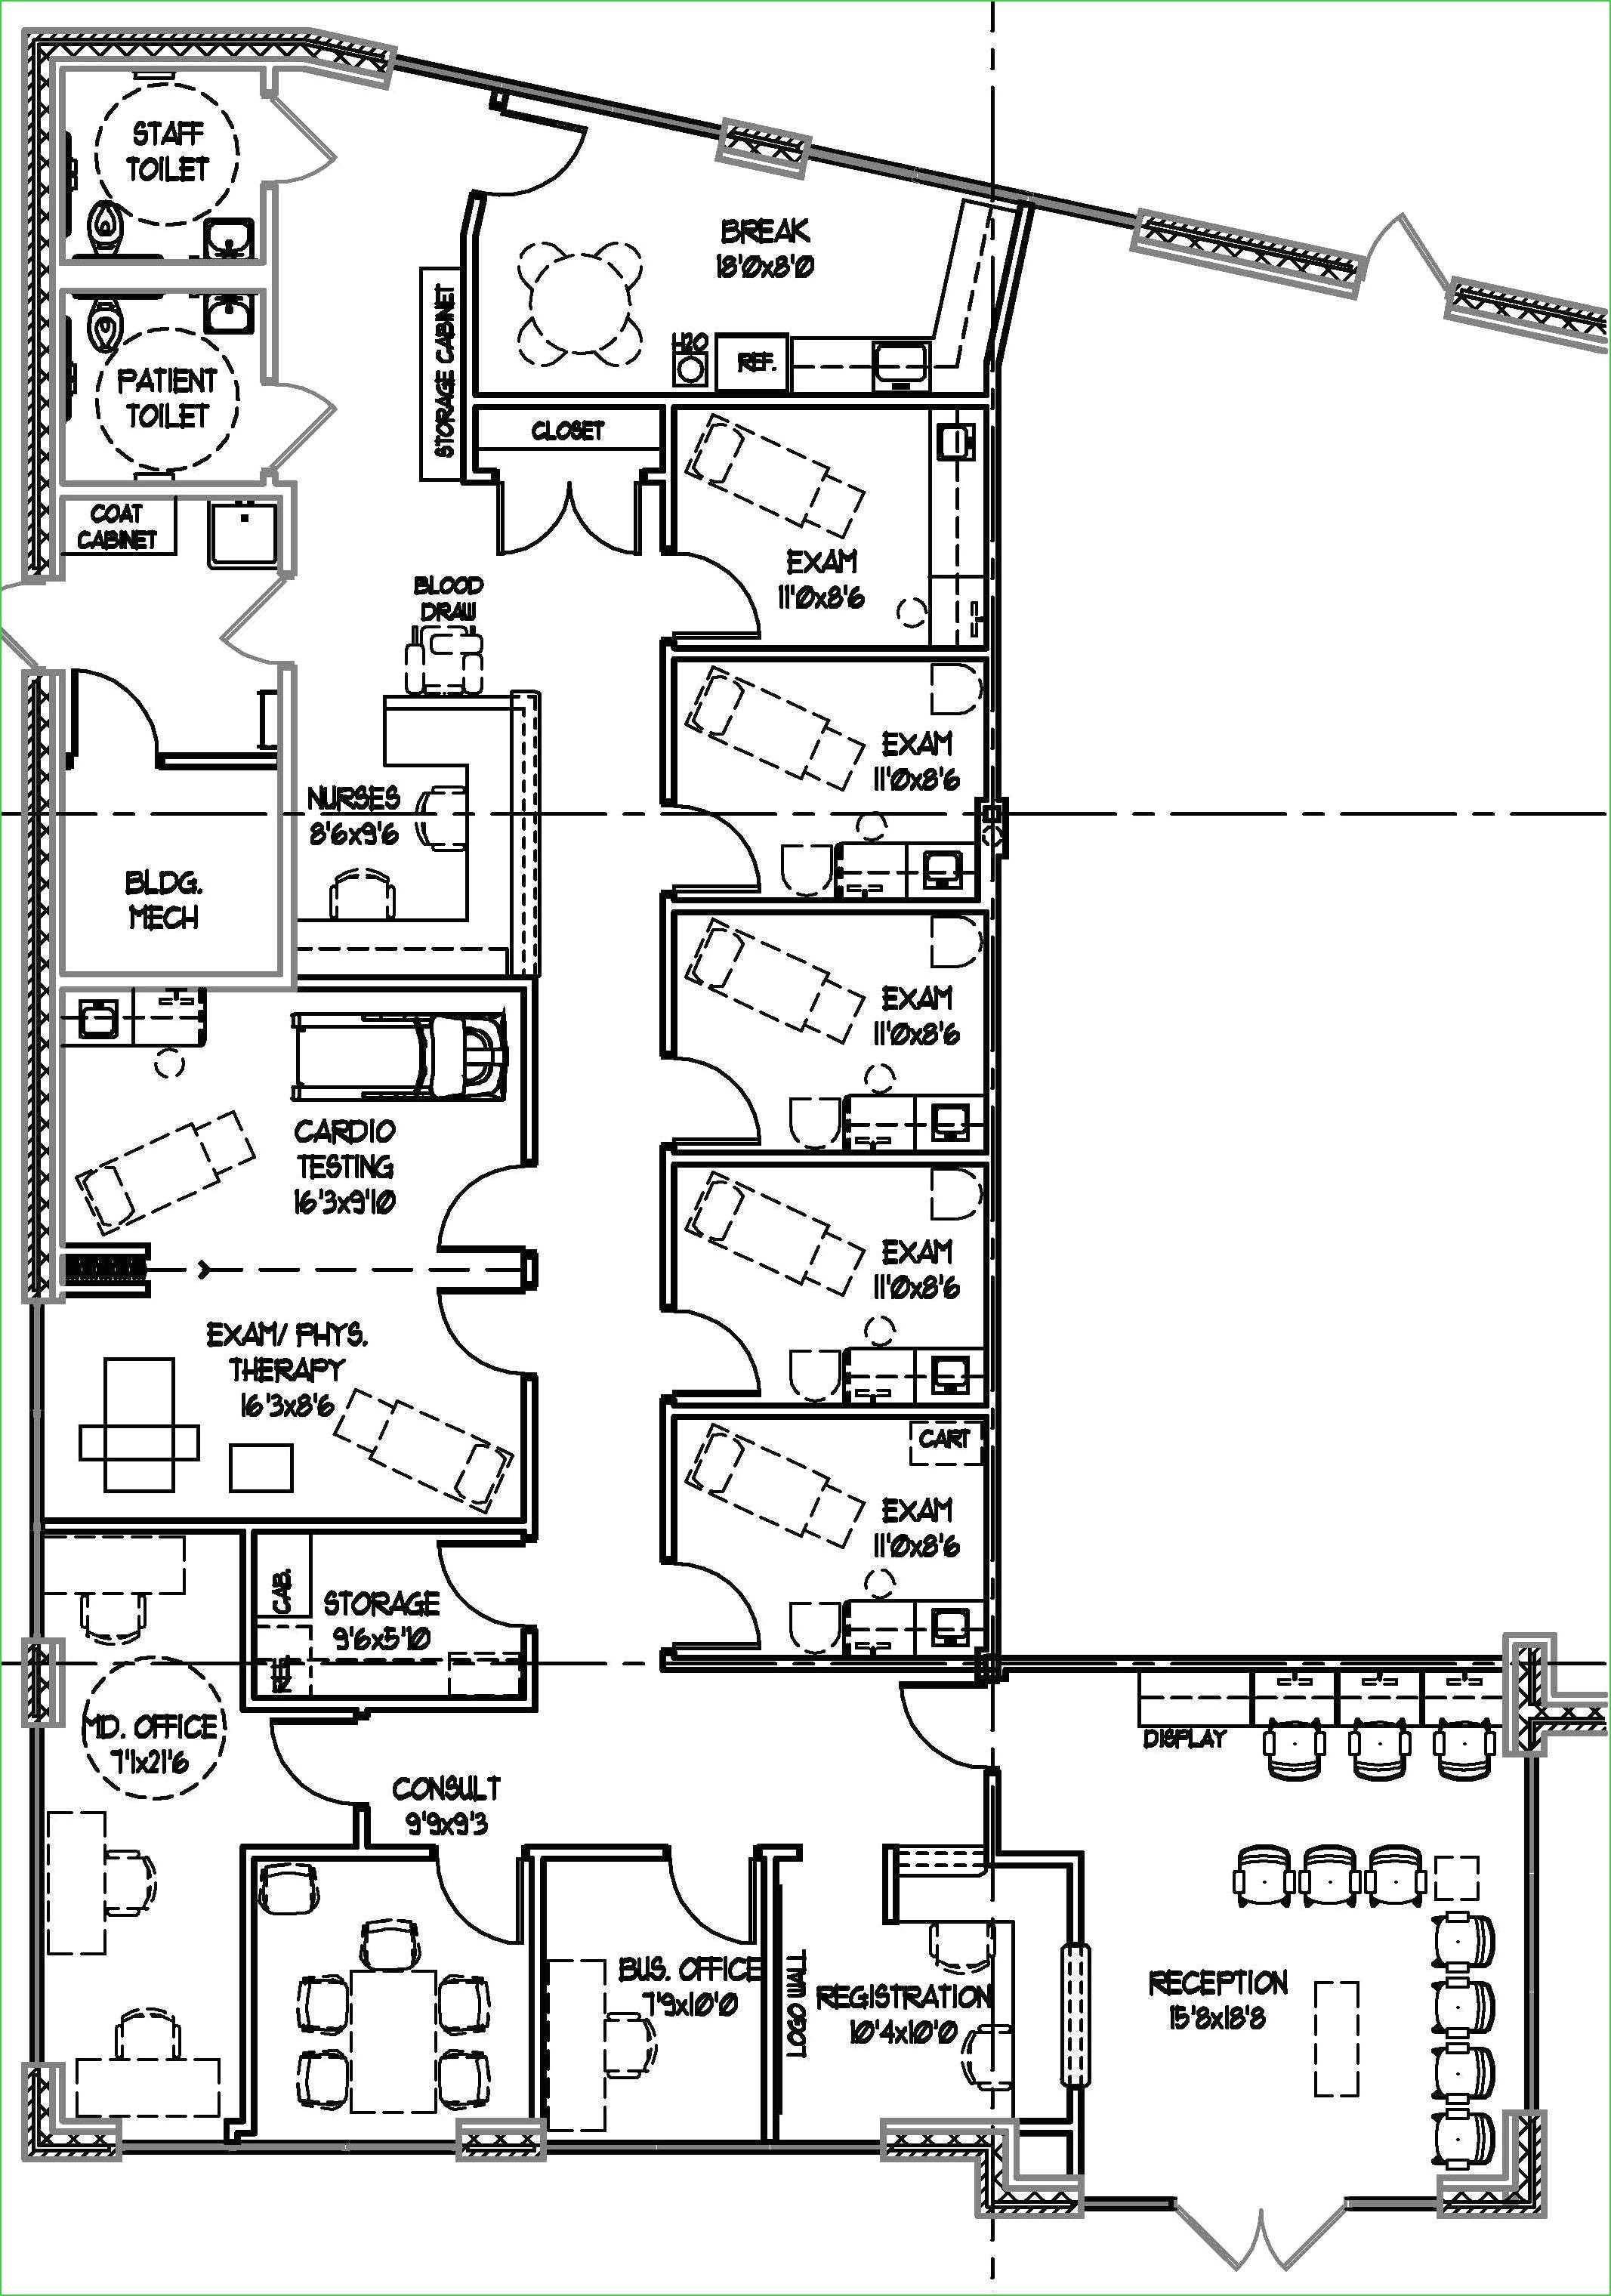 design my own brochure fresh design your own home plans luxury floor plan brochure 0d design